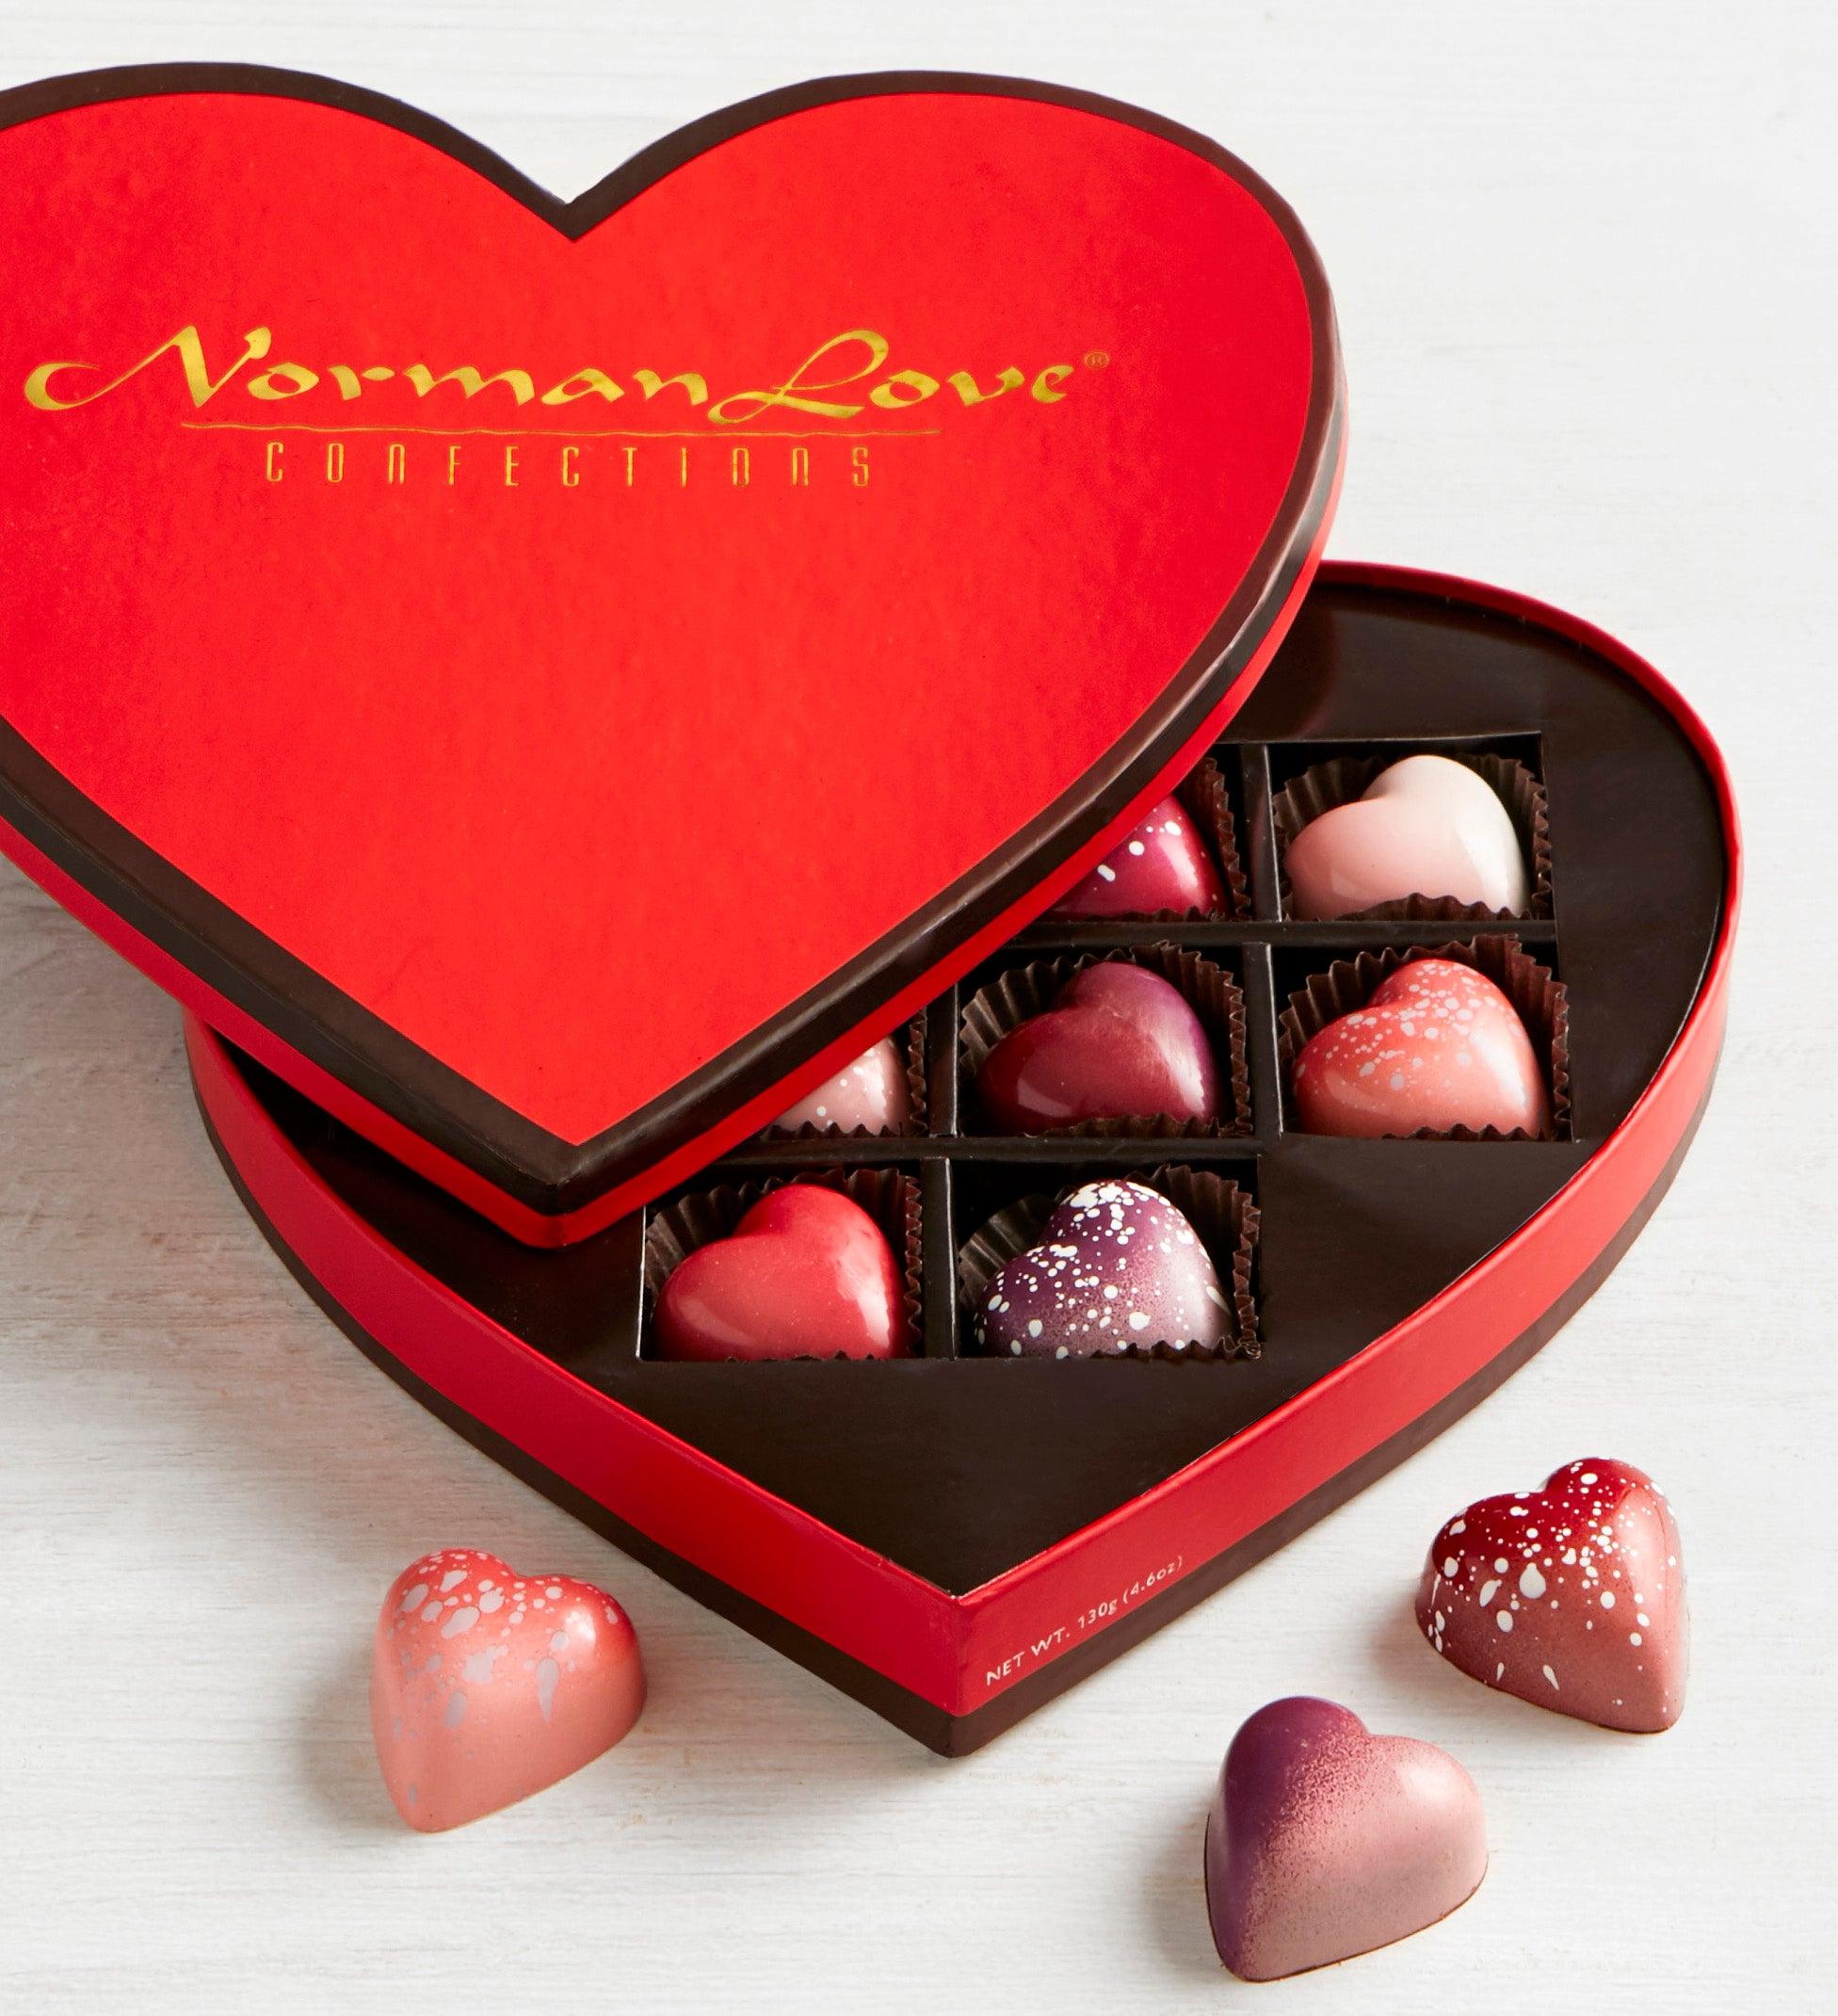 Norman Love Confections  pc Heart Box